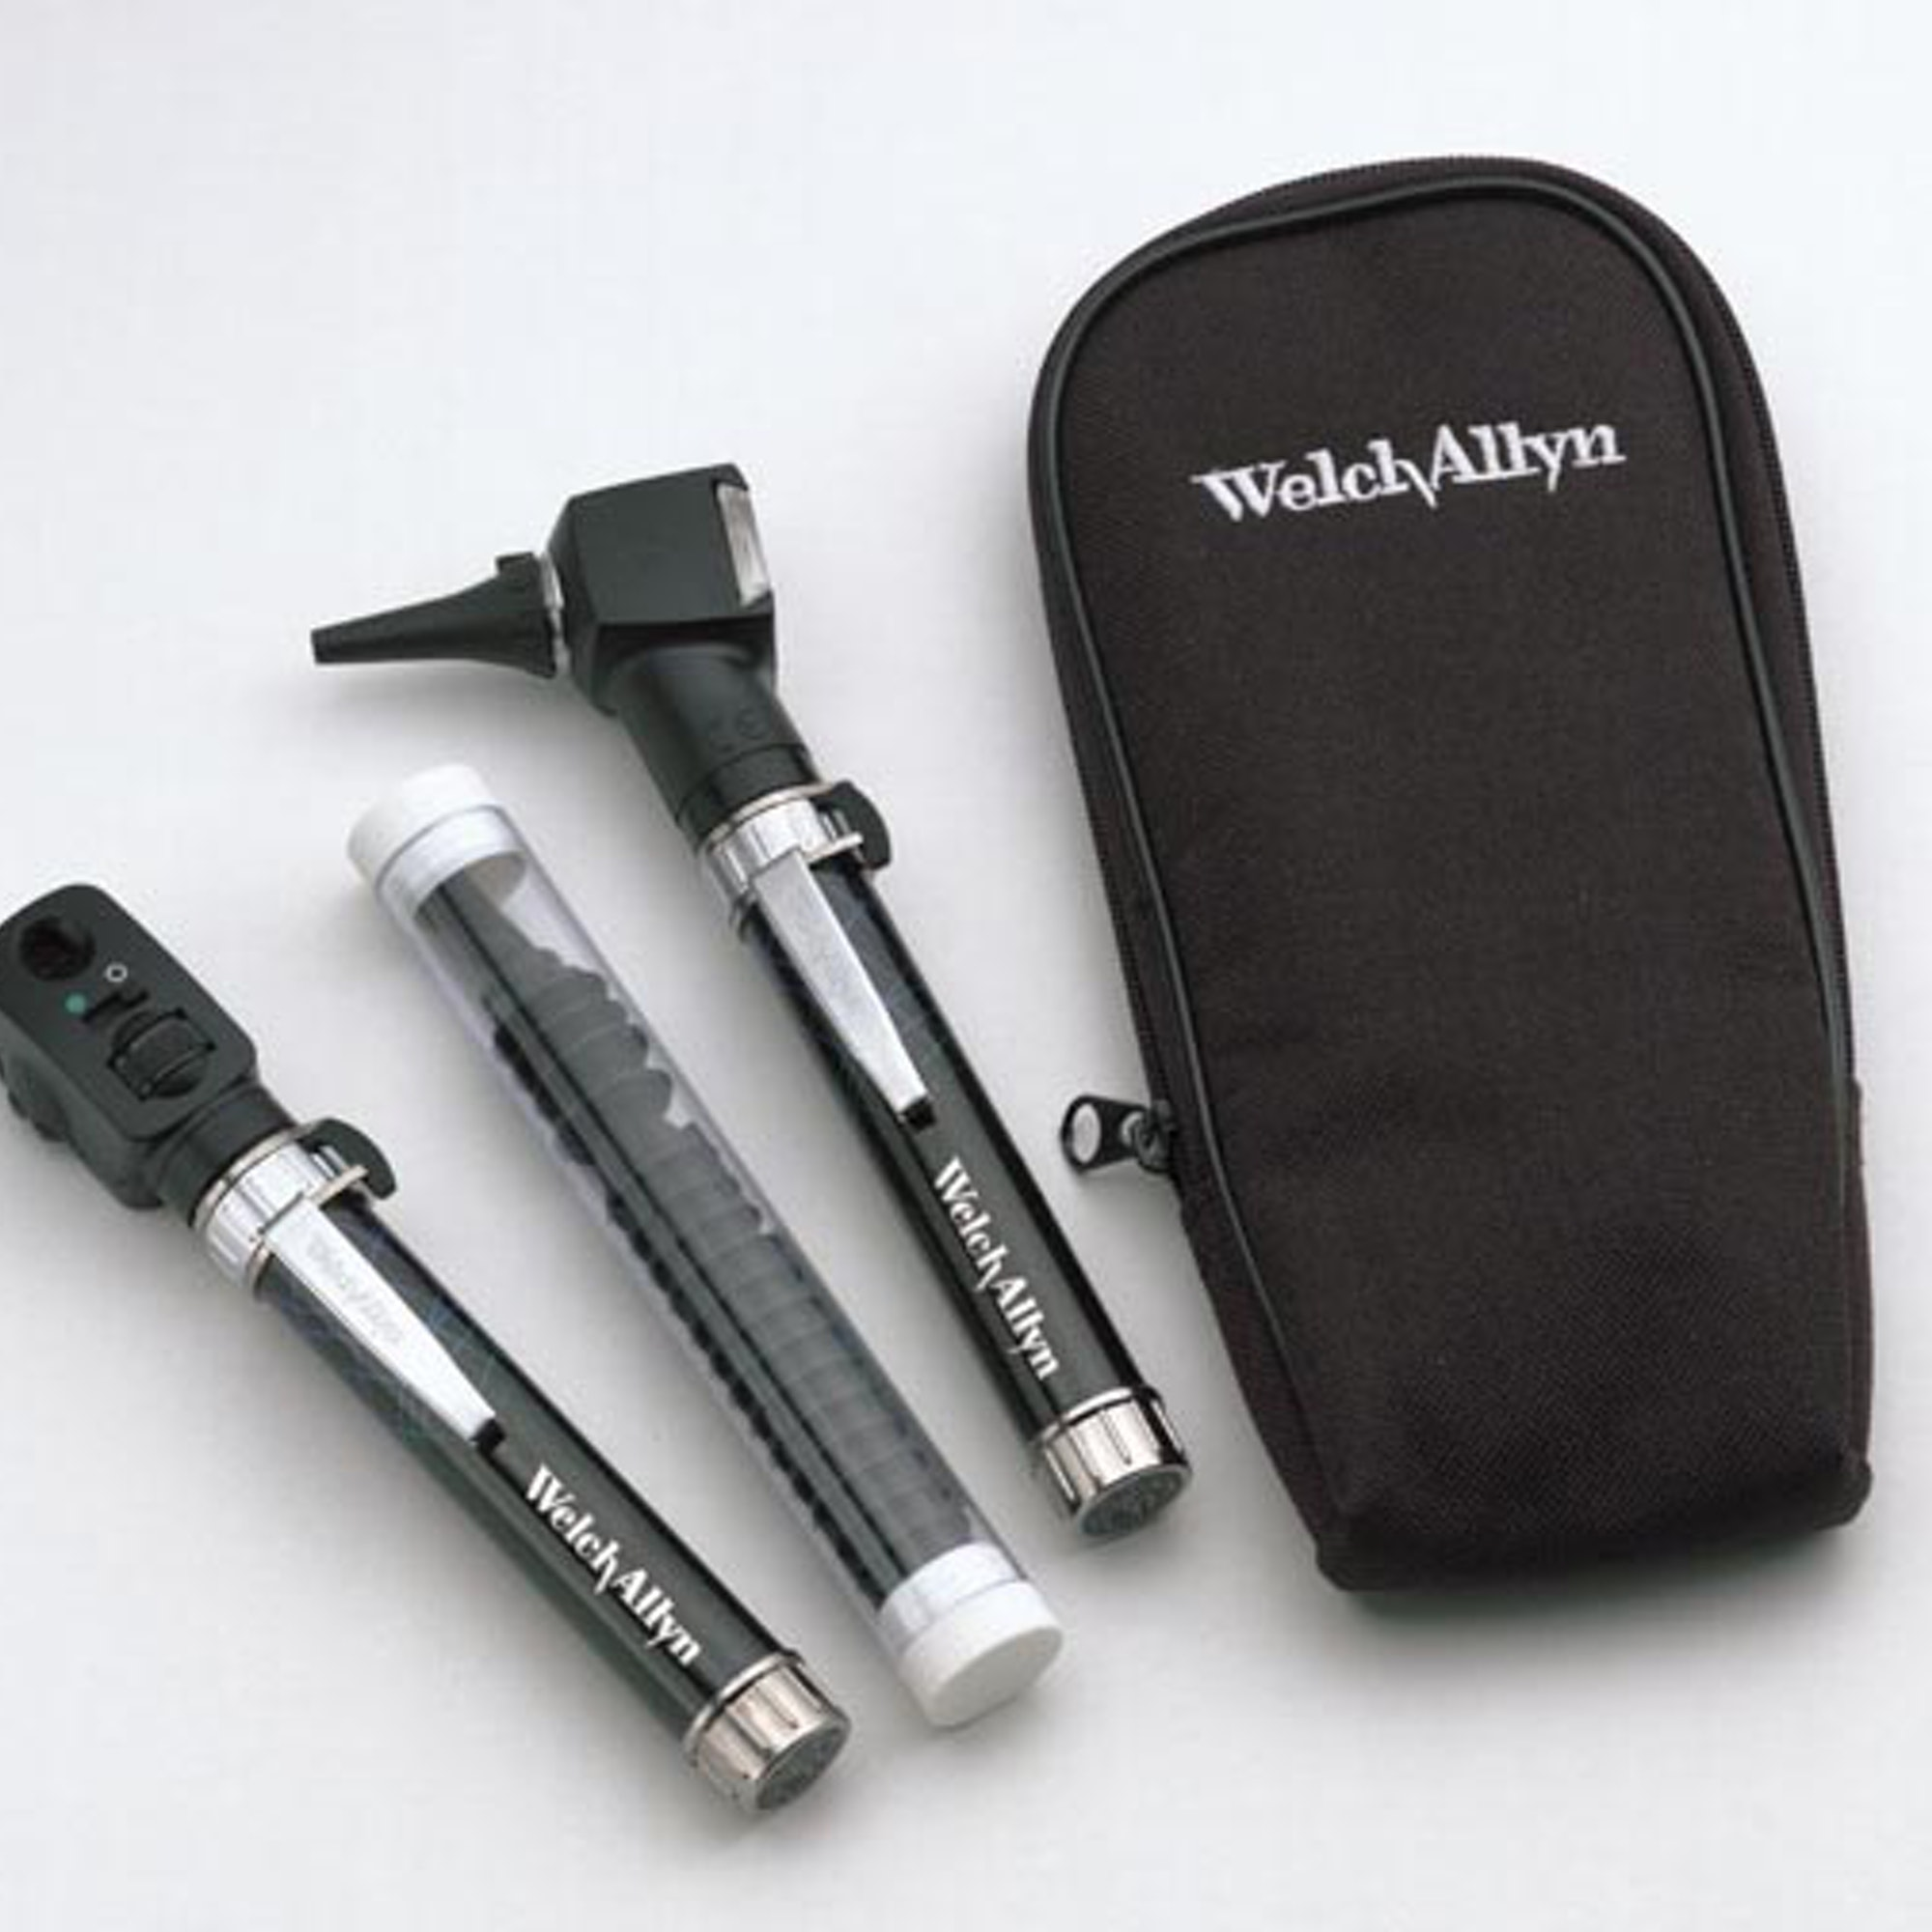 Estuche de Diagnóstico de Bolsillo Pocket Jr 2.5V